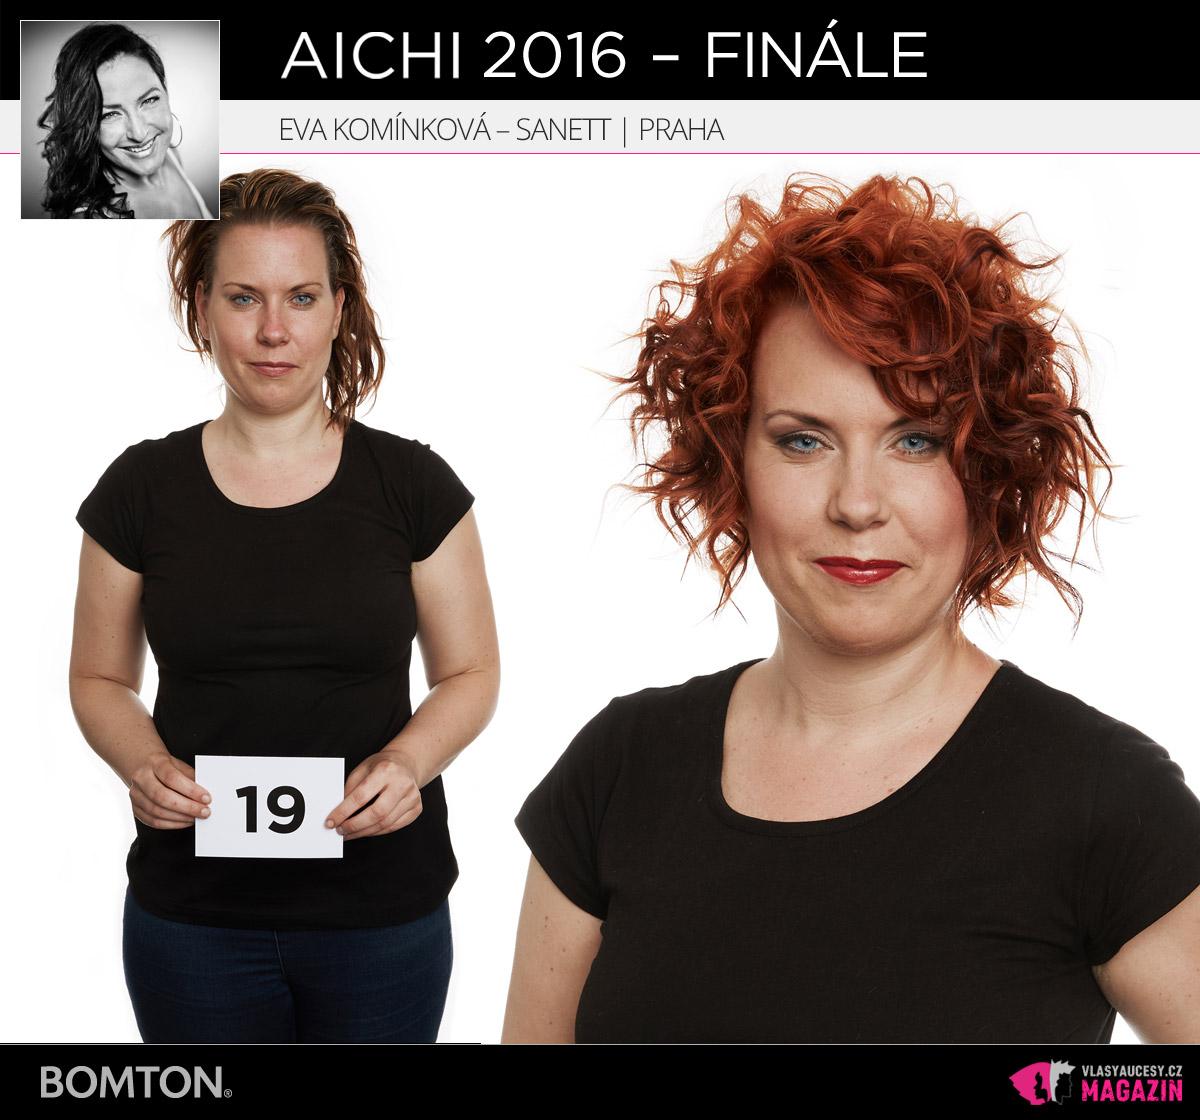 Semifinálová proměna AICHI 2016: Eva Komínková, Sanett, Praha